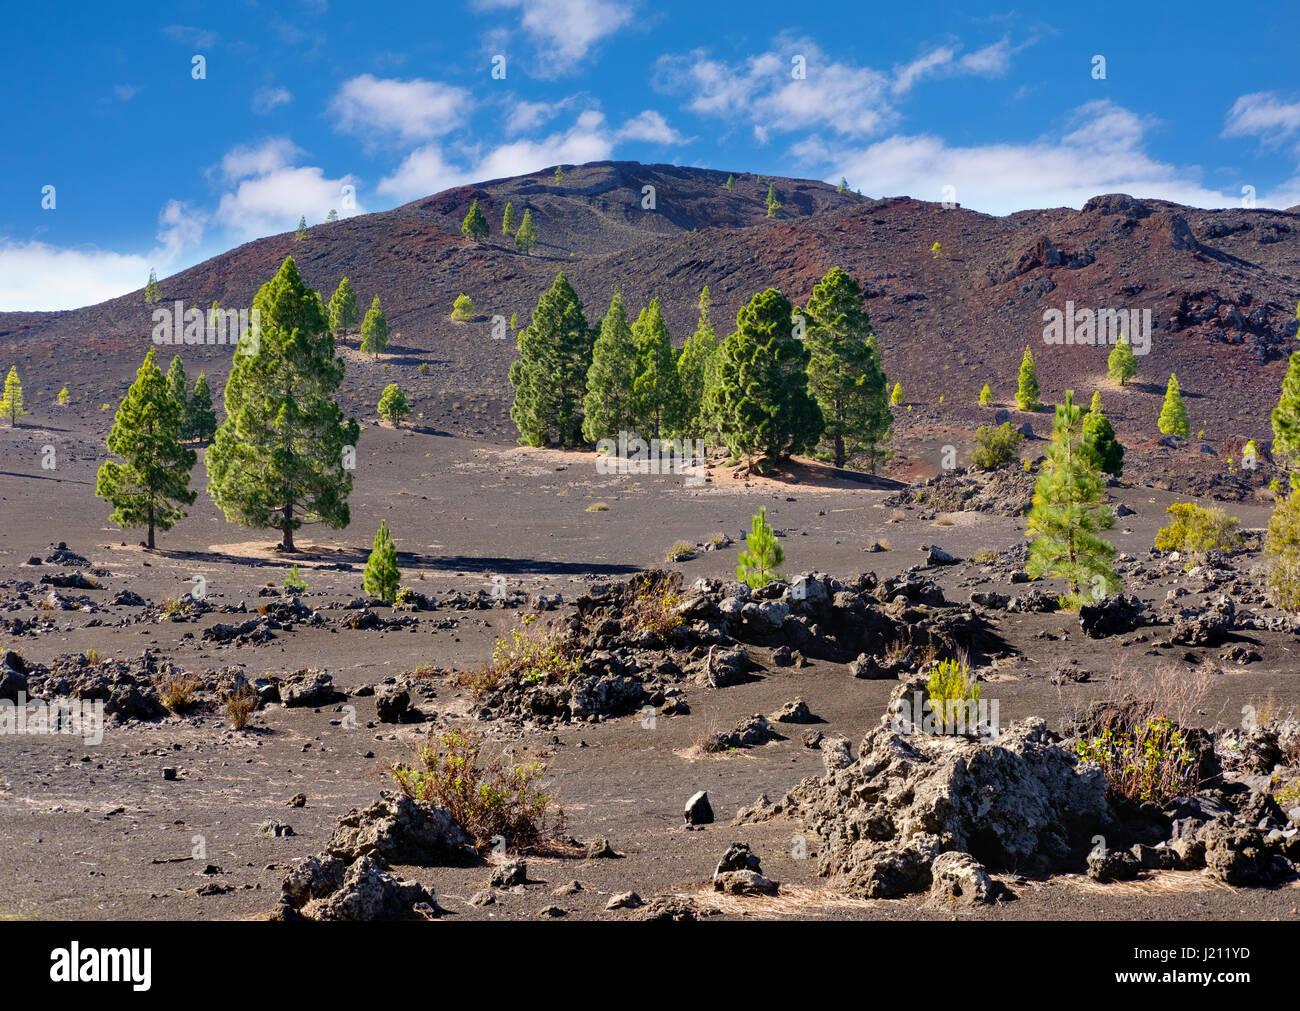 7pines teneriffa 3 pin plug wiring diagram montana negra stock photos and images